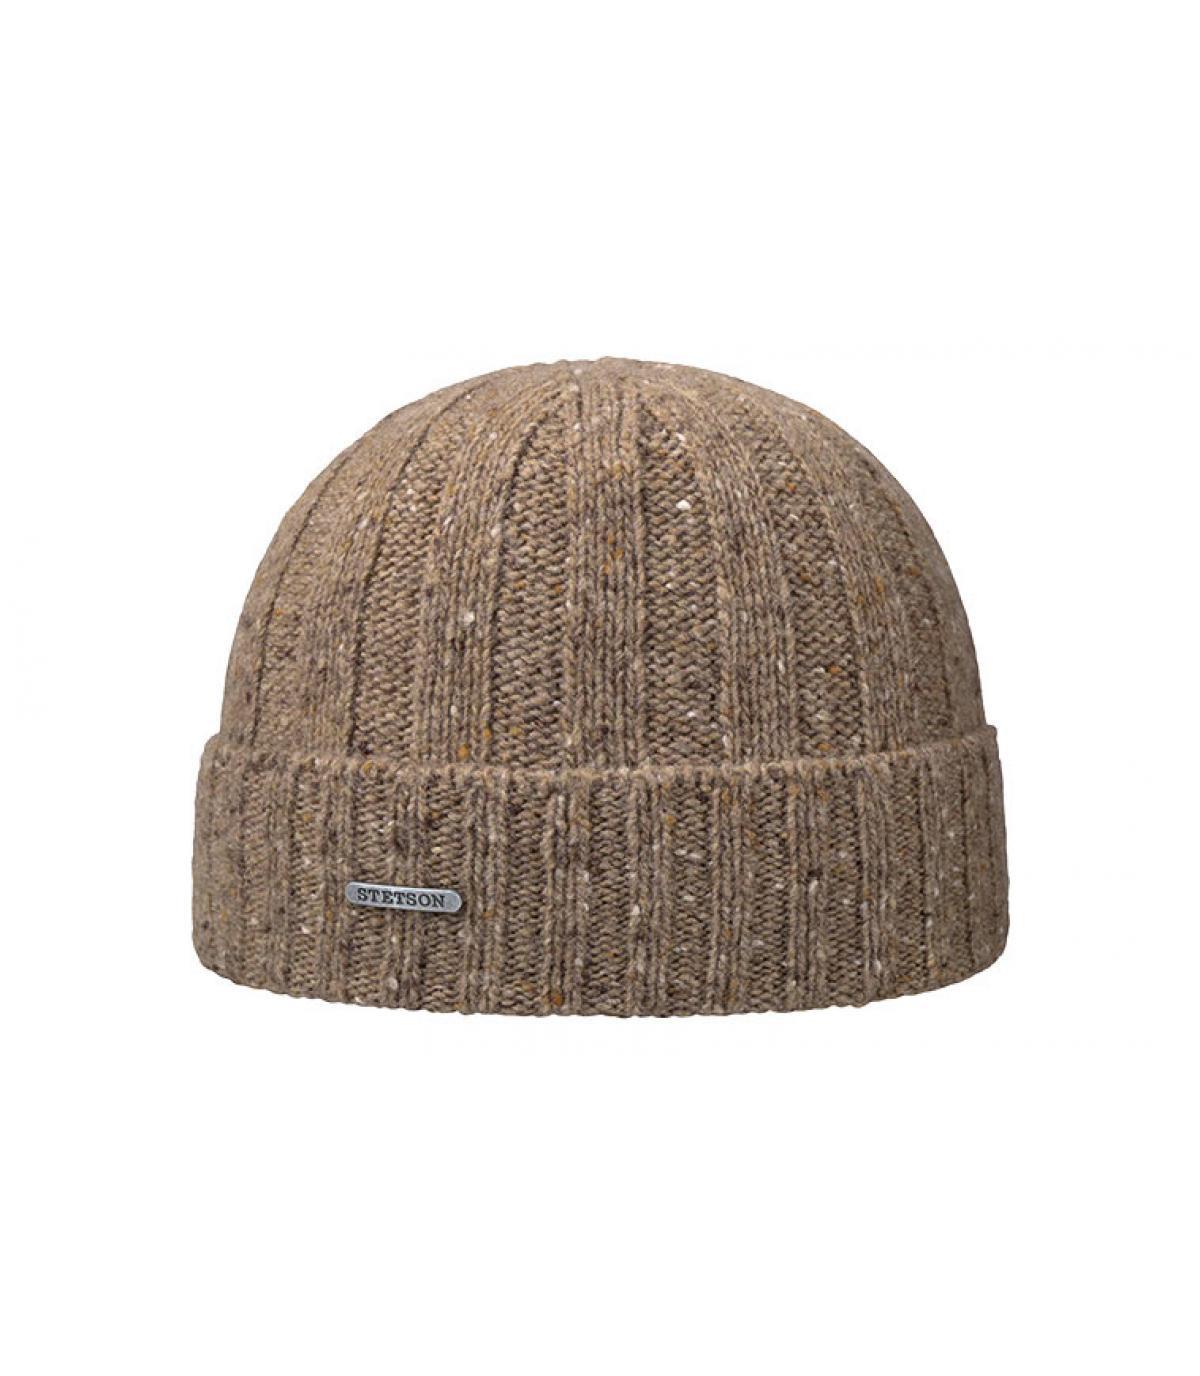 gorro marrón lana puño